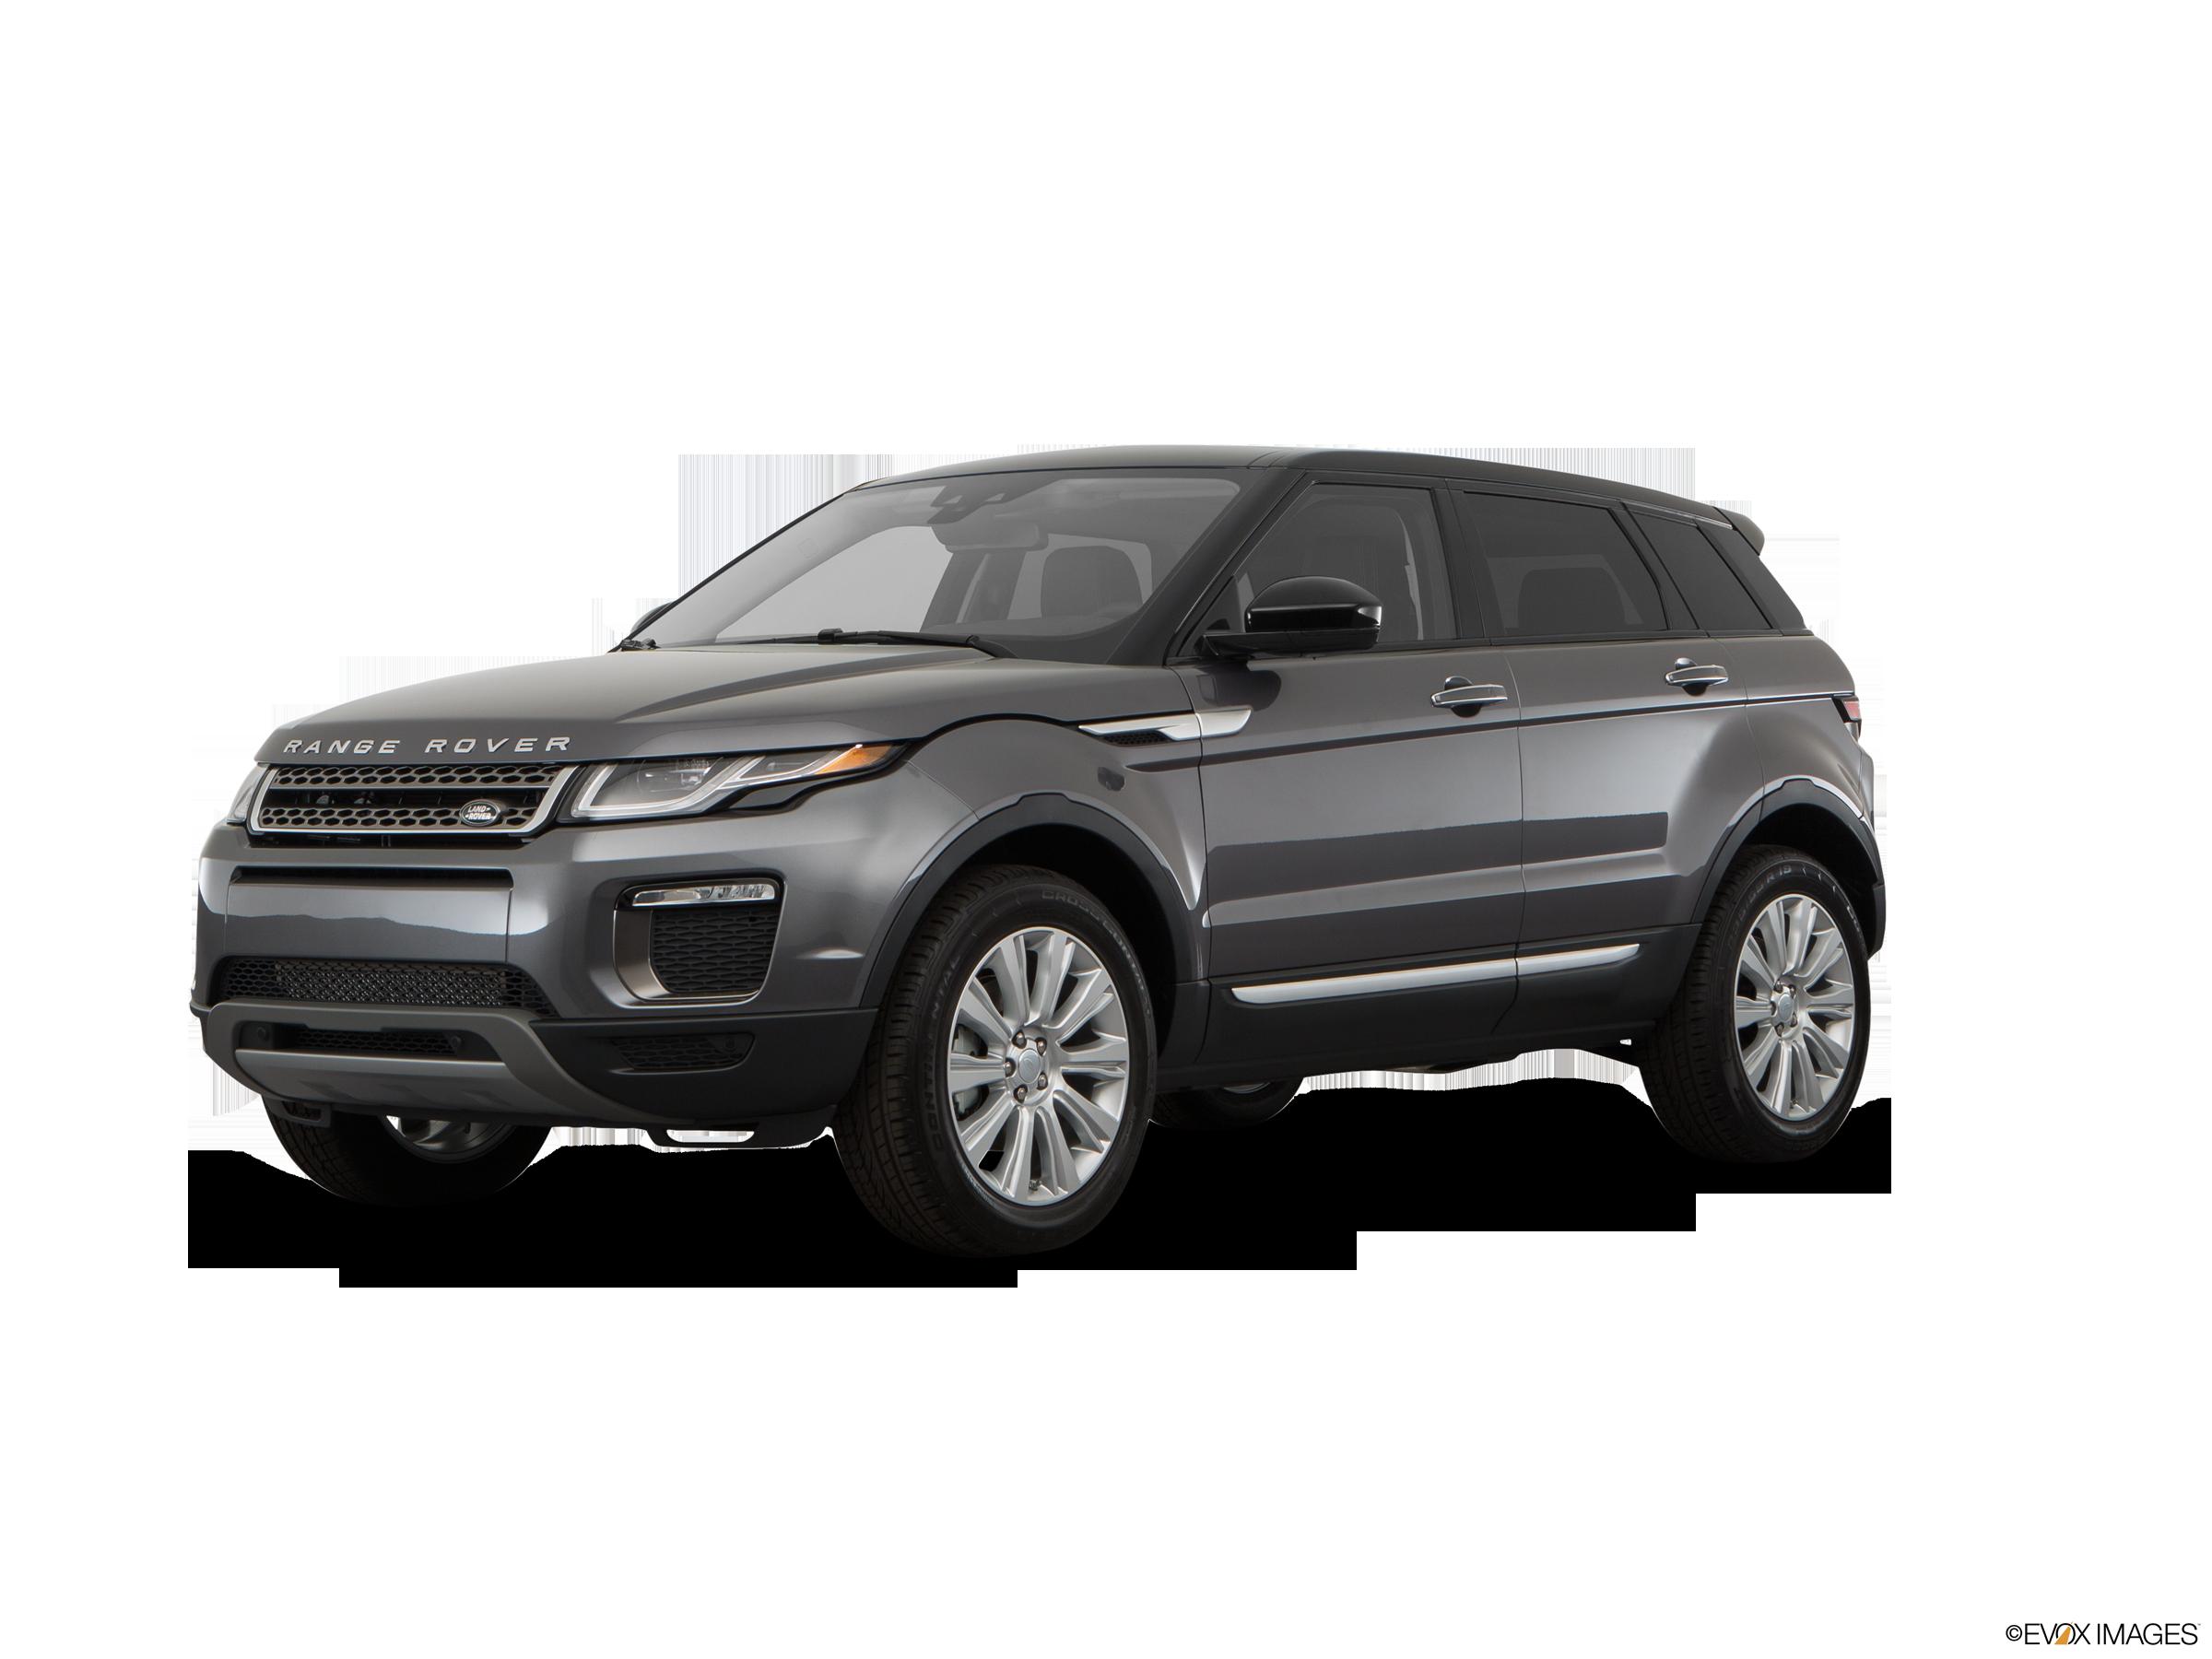 2018 Land Rover Range Rover Evoque Pricing Reviews